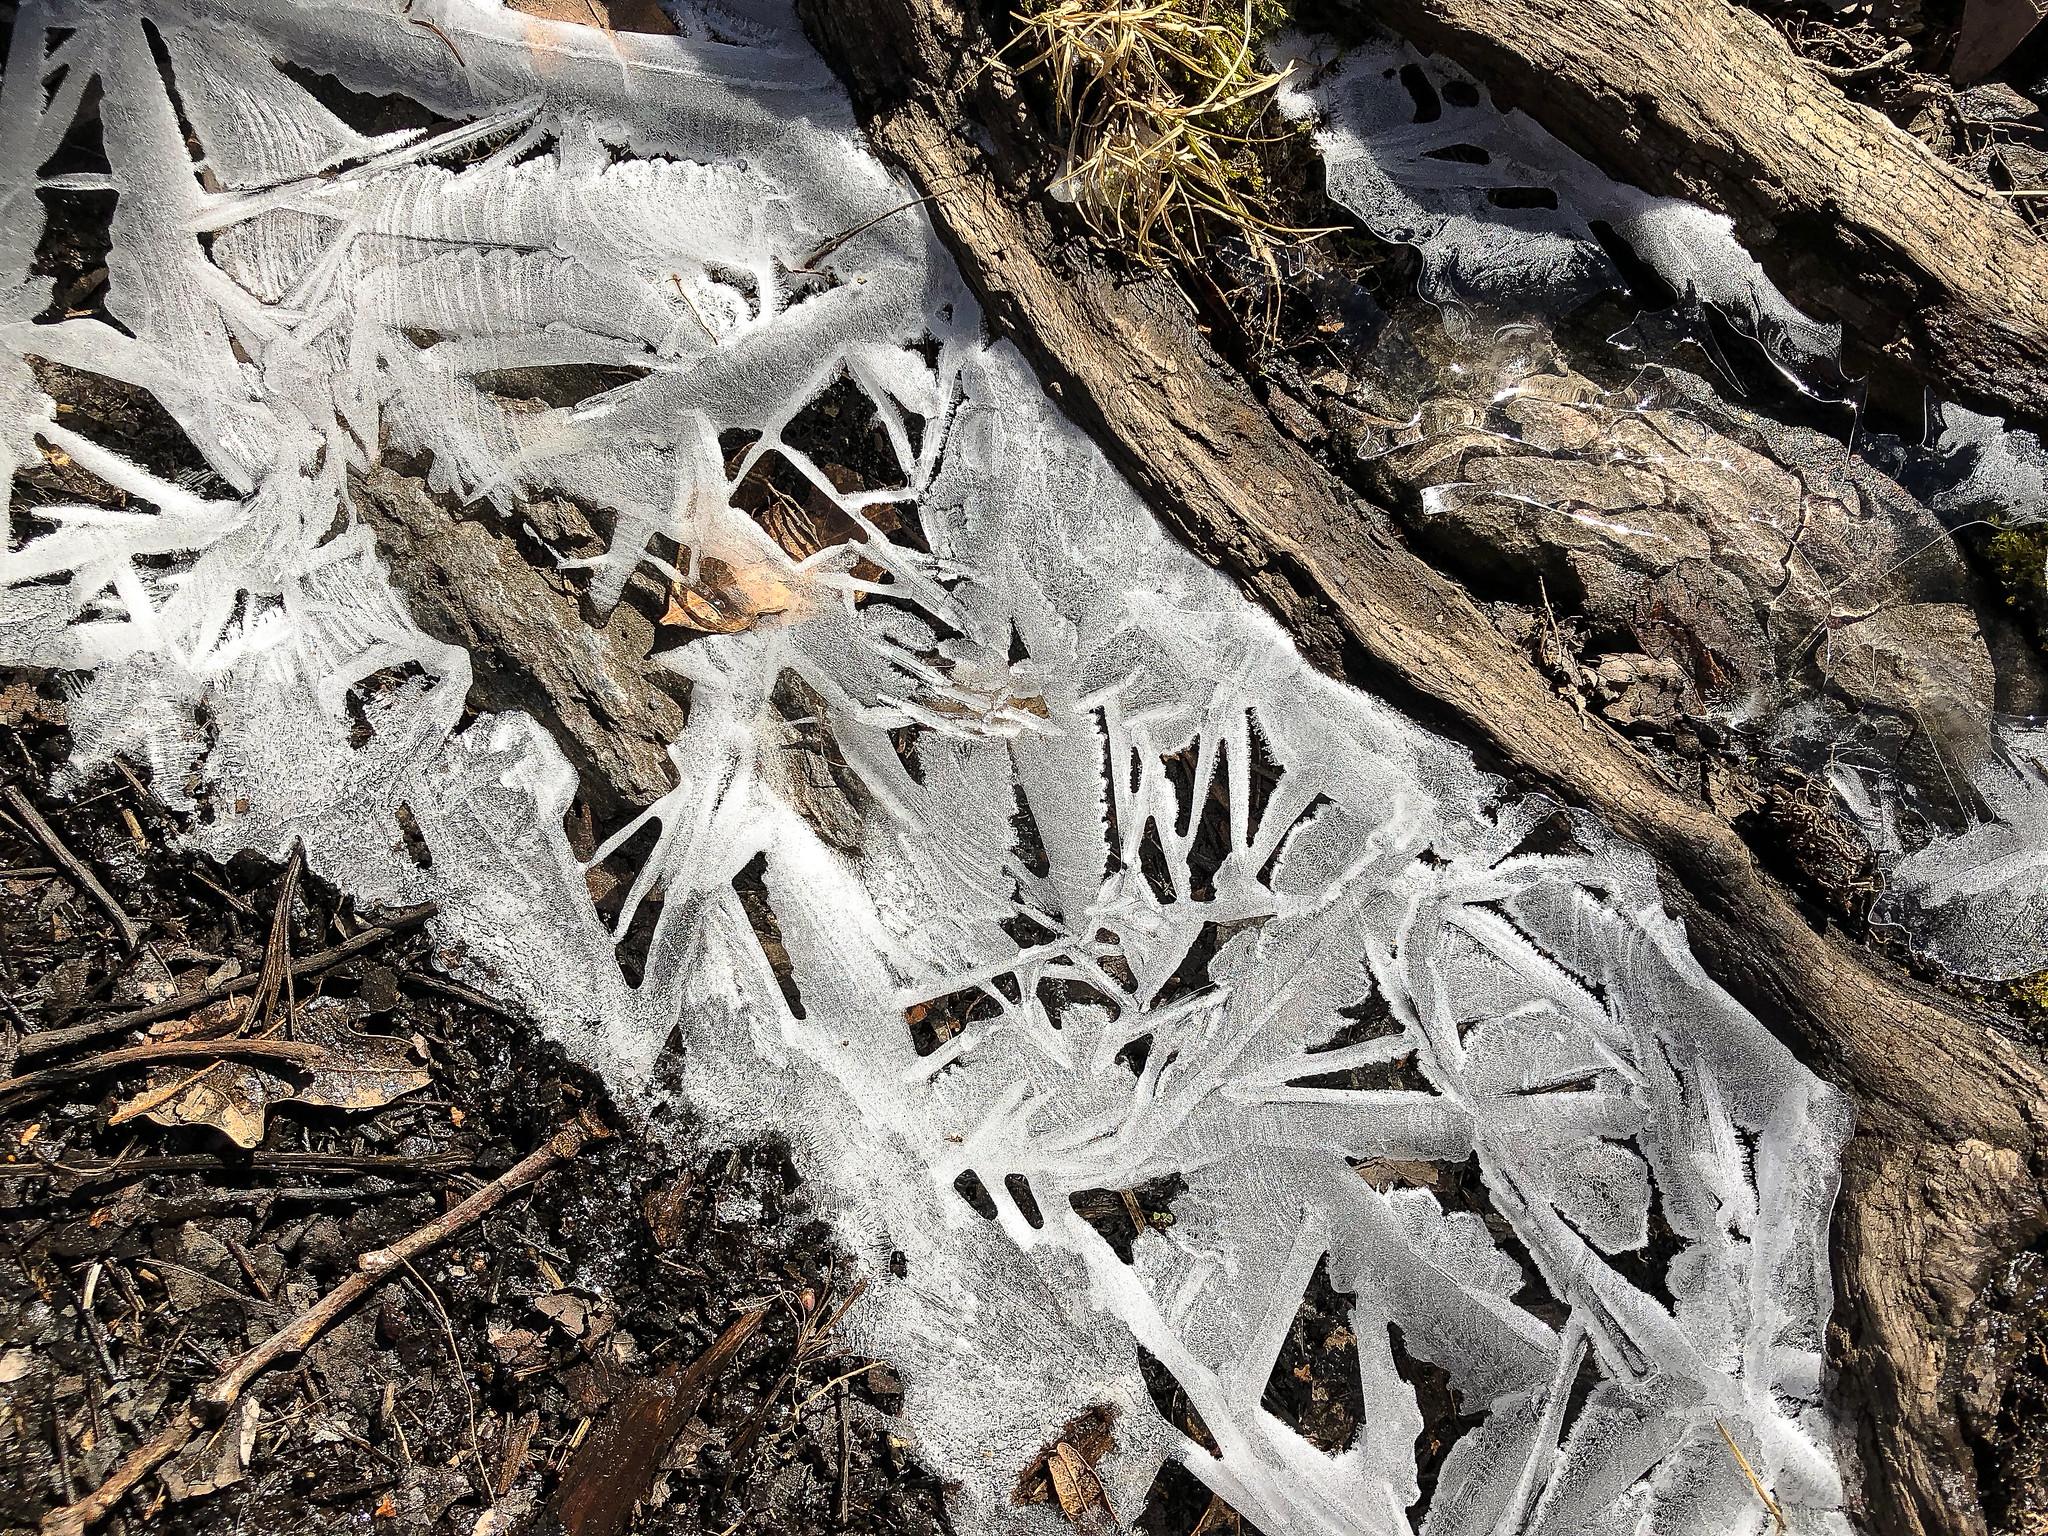 Ice in a rut